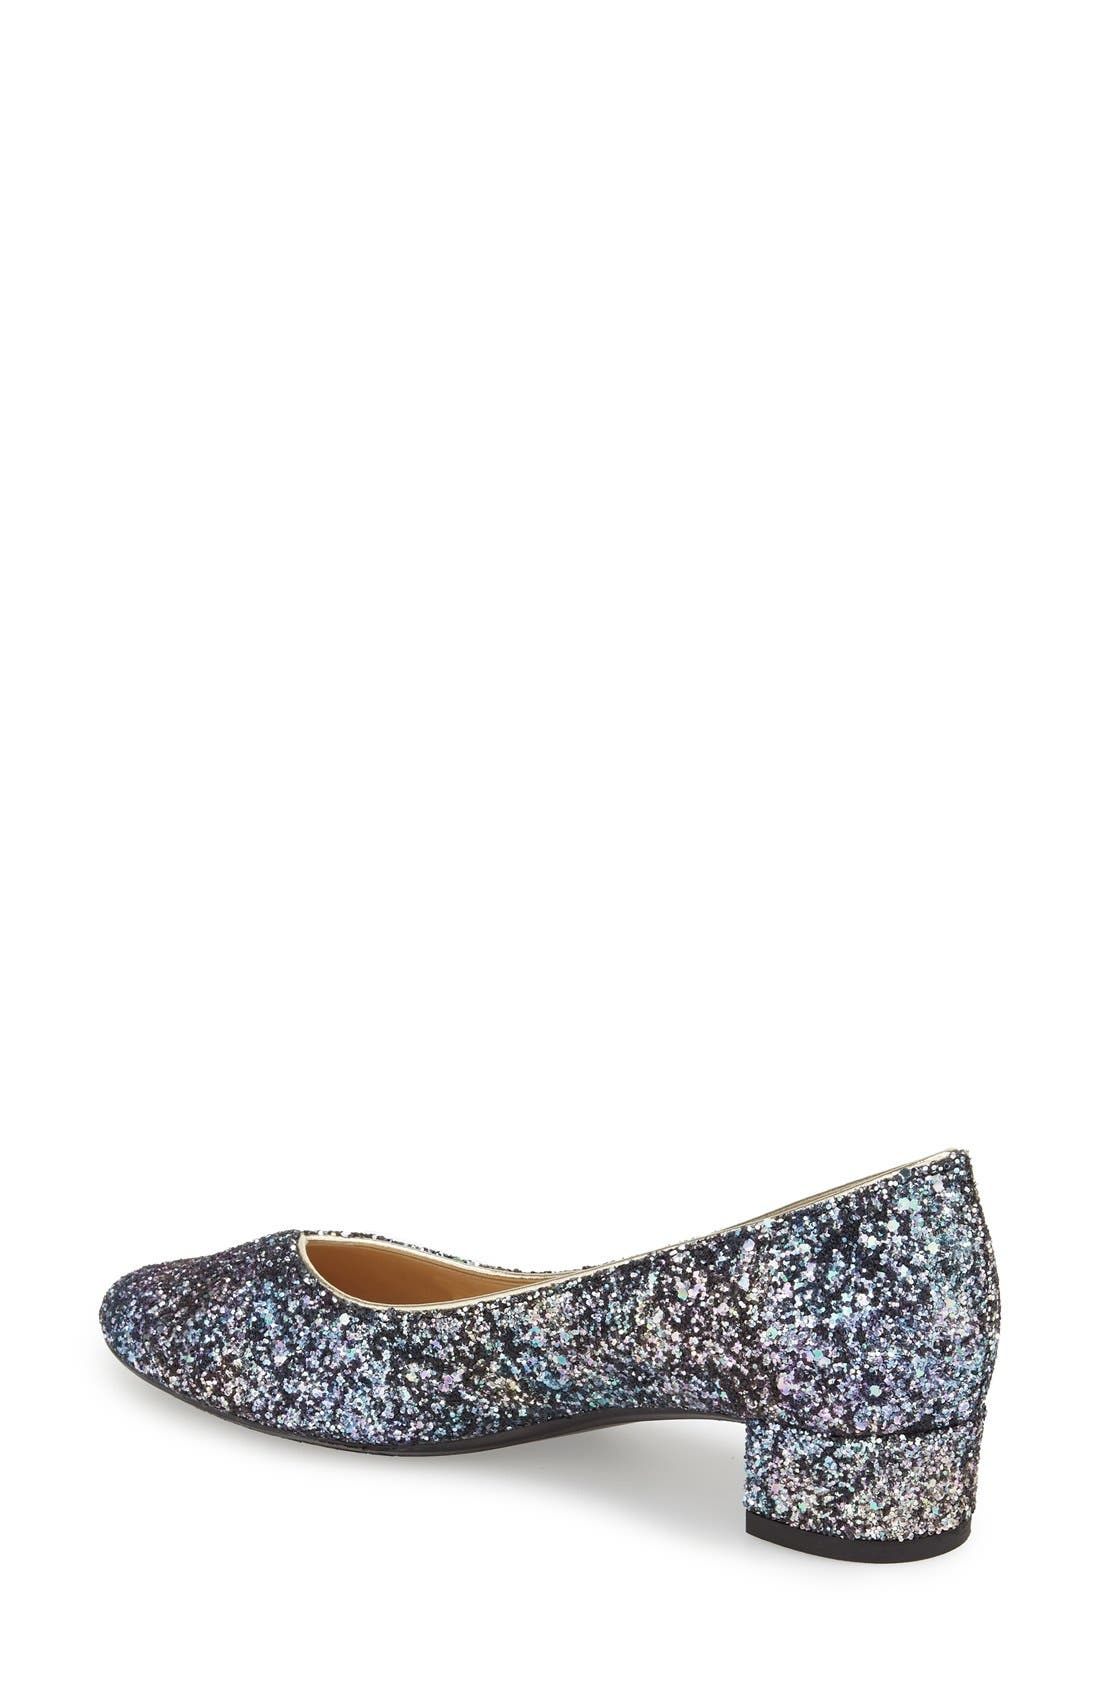 'Bambalina' Block Heel Glitter Pump,                             Alternate thumbnail 11, color,